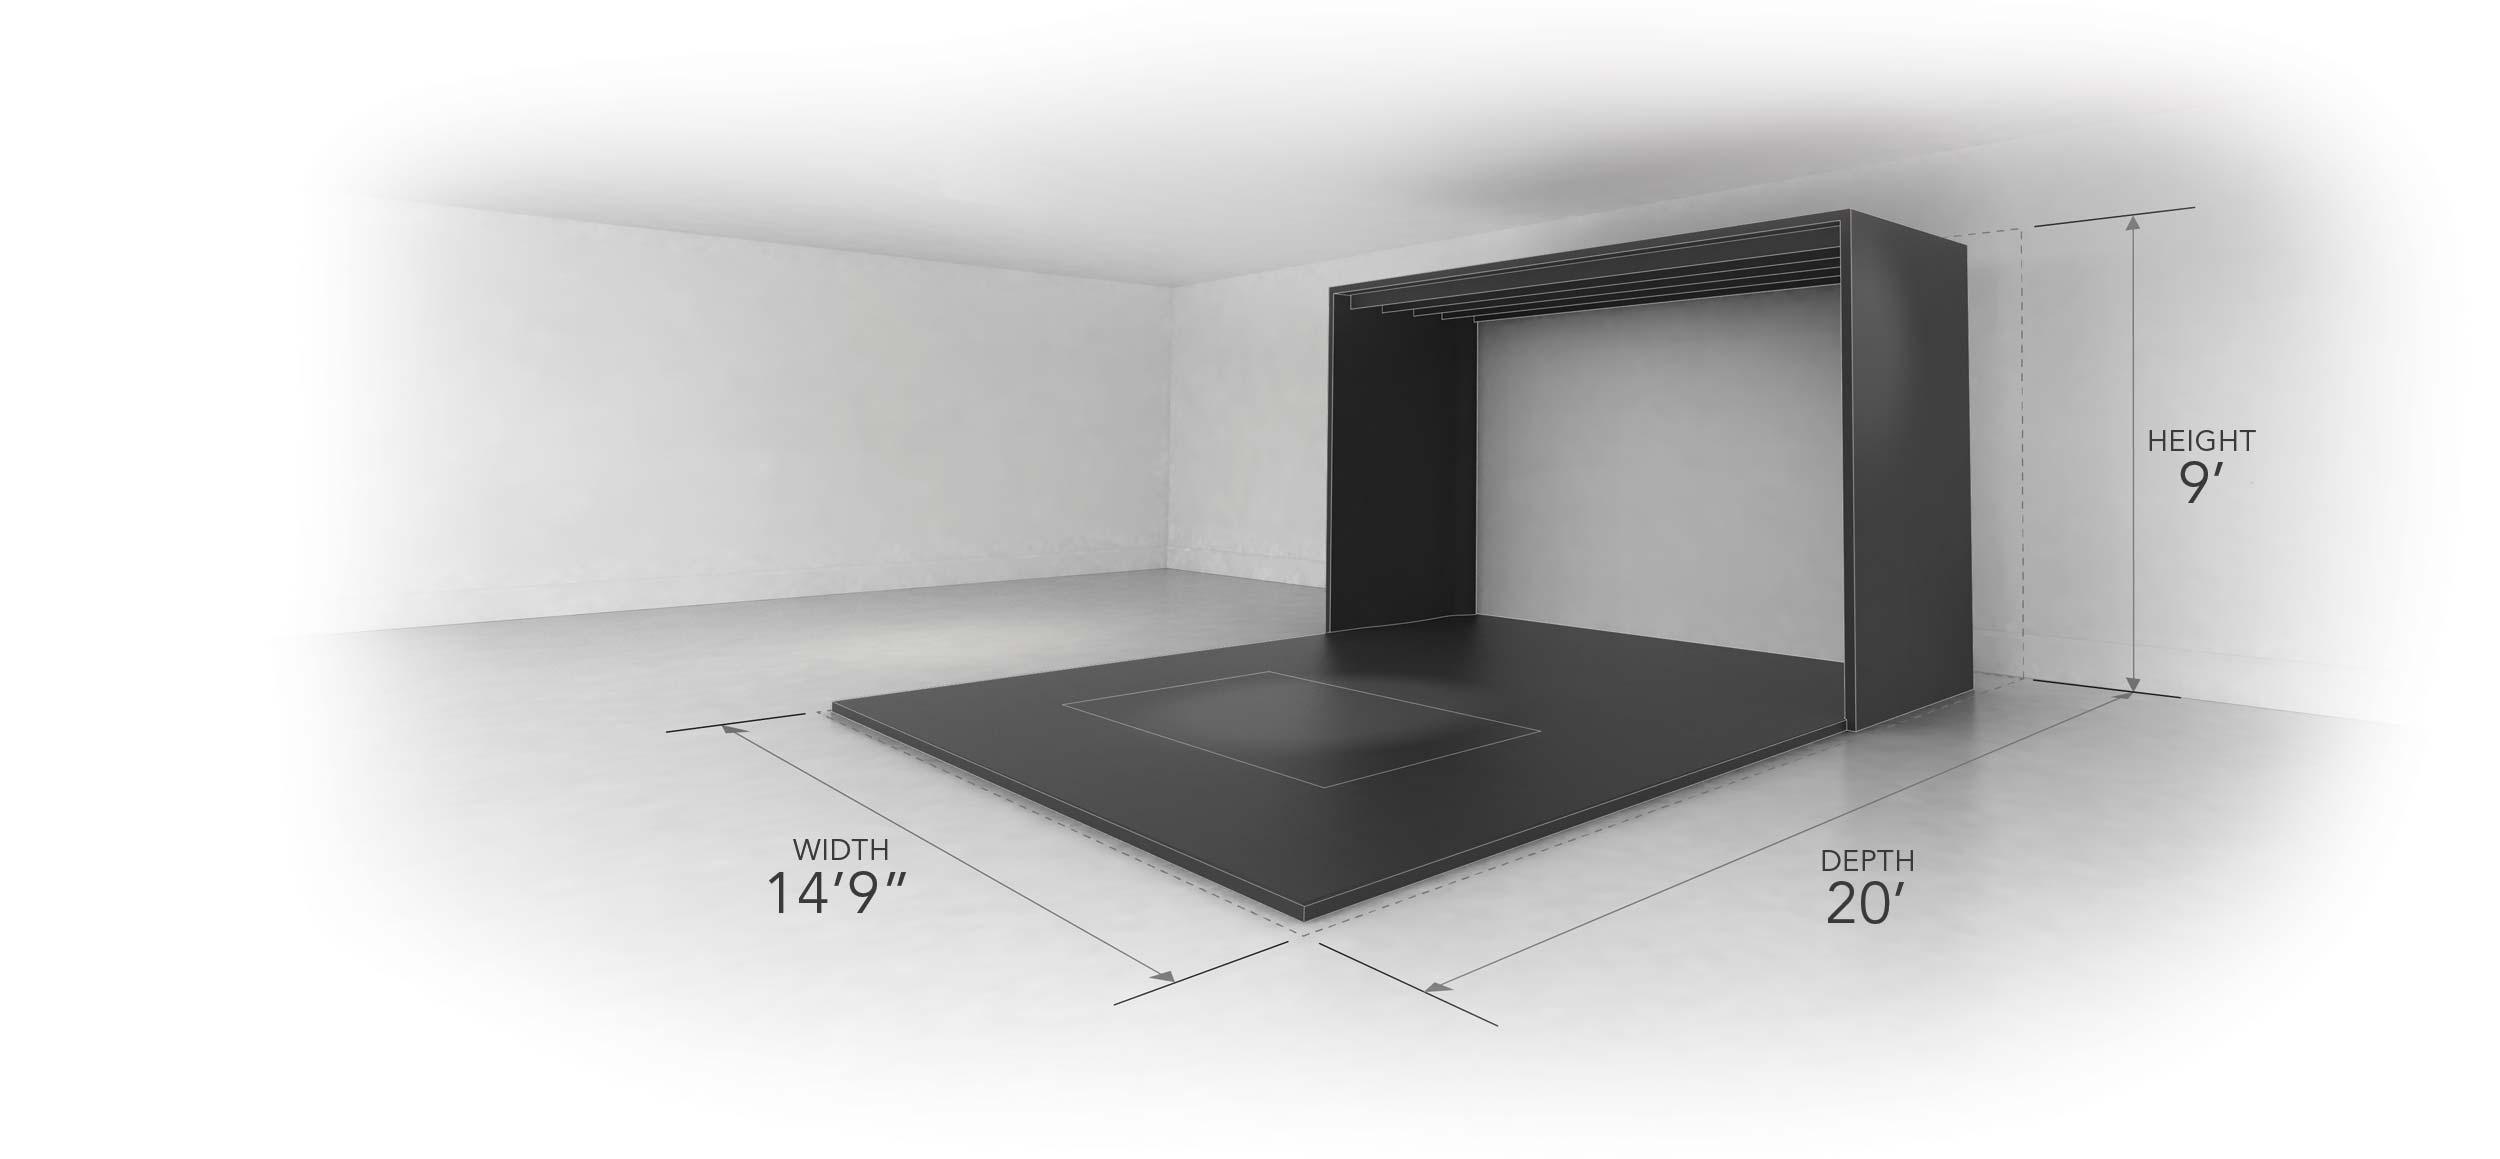 Wide-Screen-Simulator-Dimensions